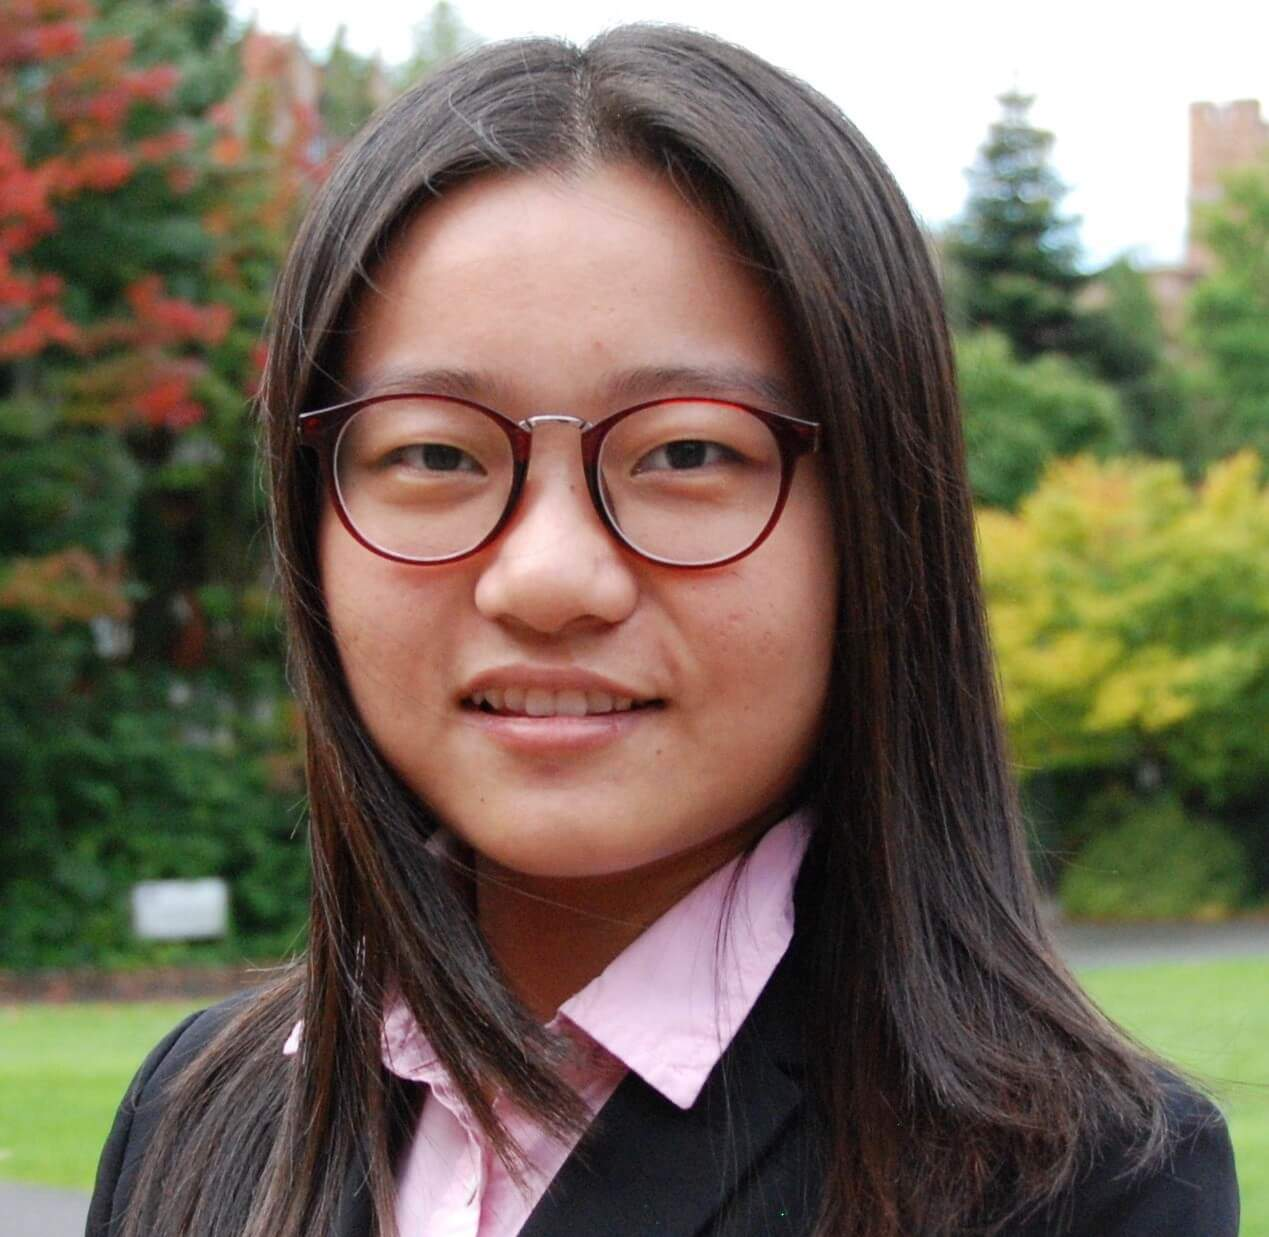 Zihui Lyu : Graduate Student